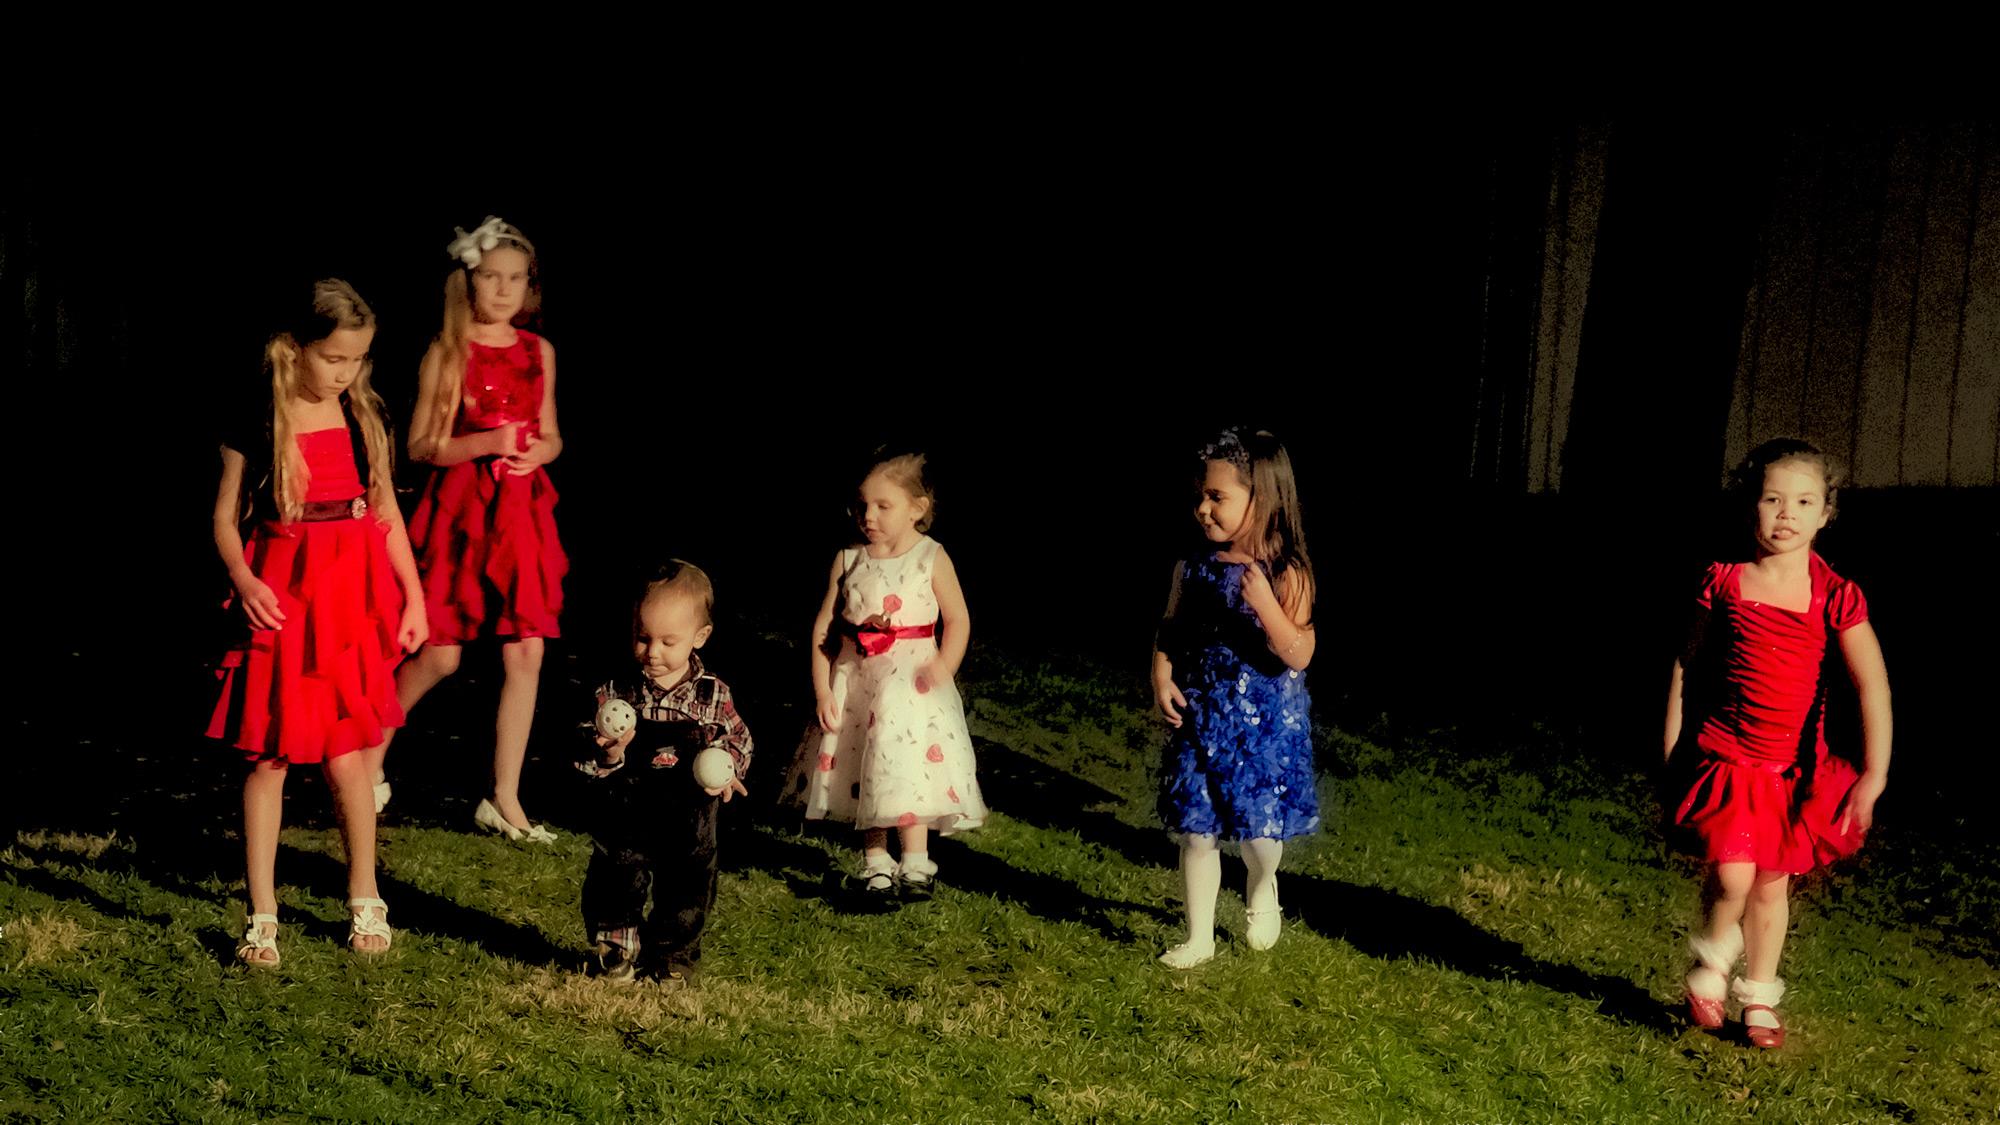 Red-Dresses-2.jpg